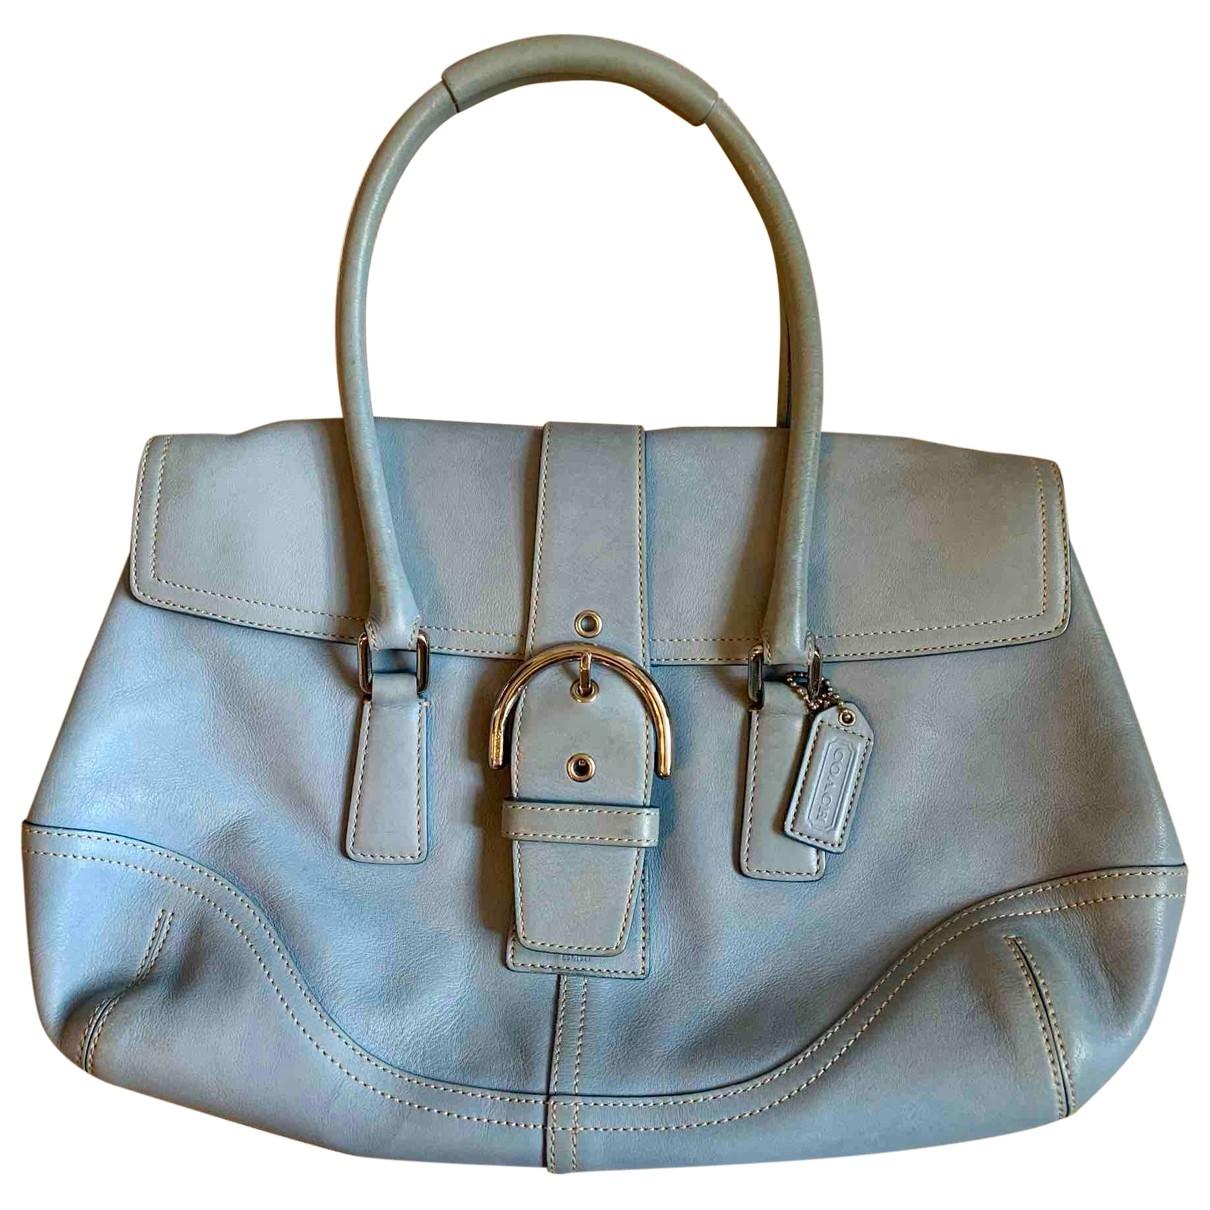 Coach Mercer satchel 24 Handtasche in  Blau Leder